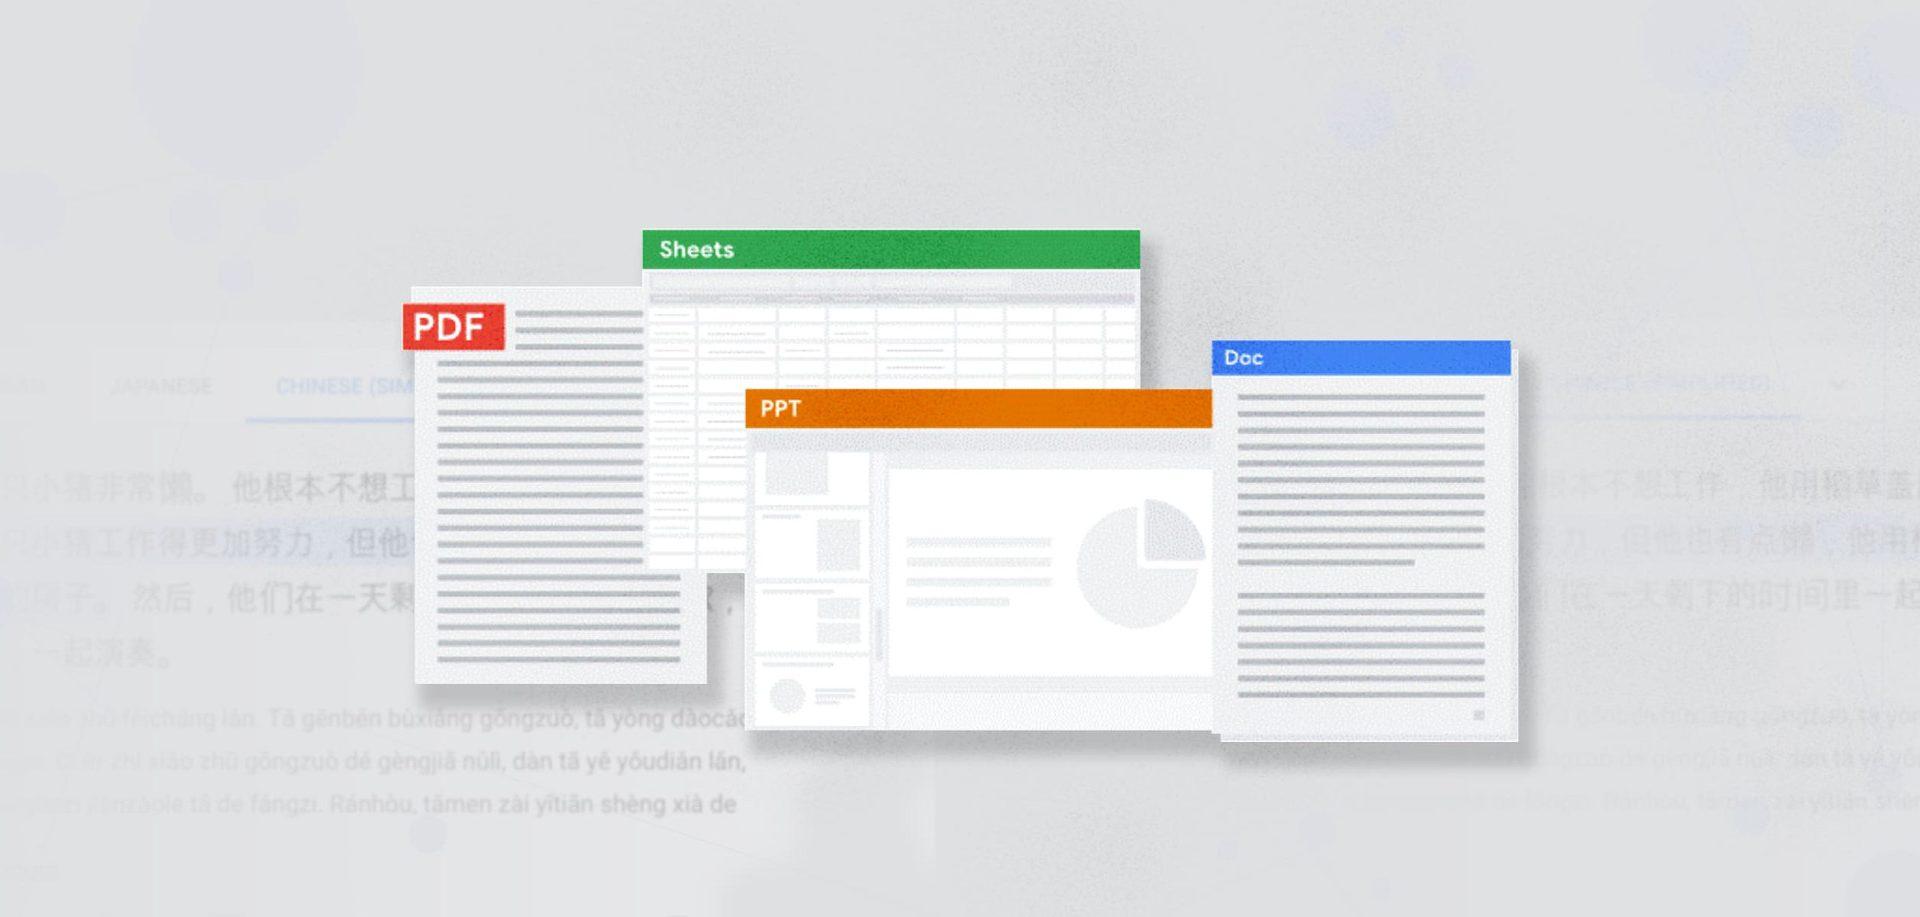 Google Cloud   AI   Doc   PDF   Sheets   PPT